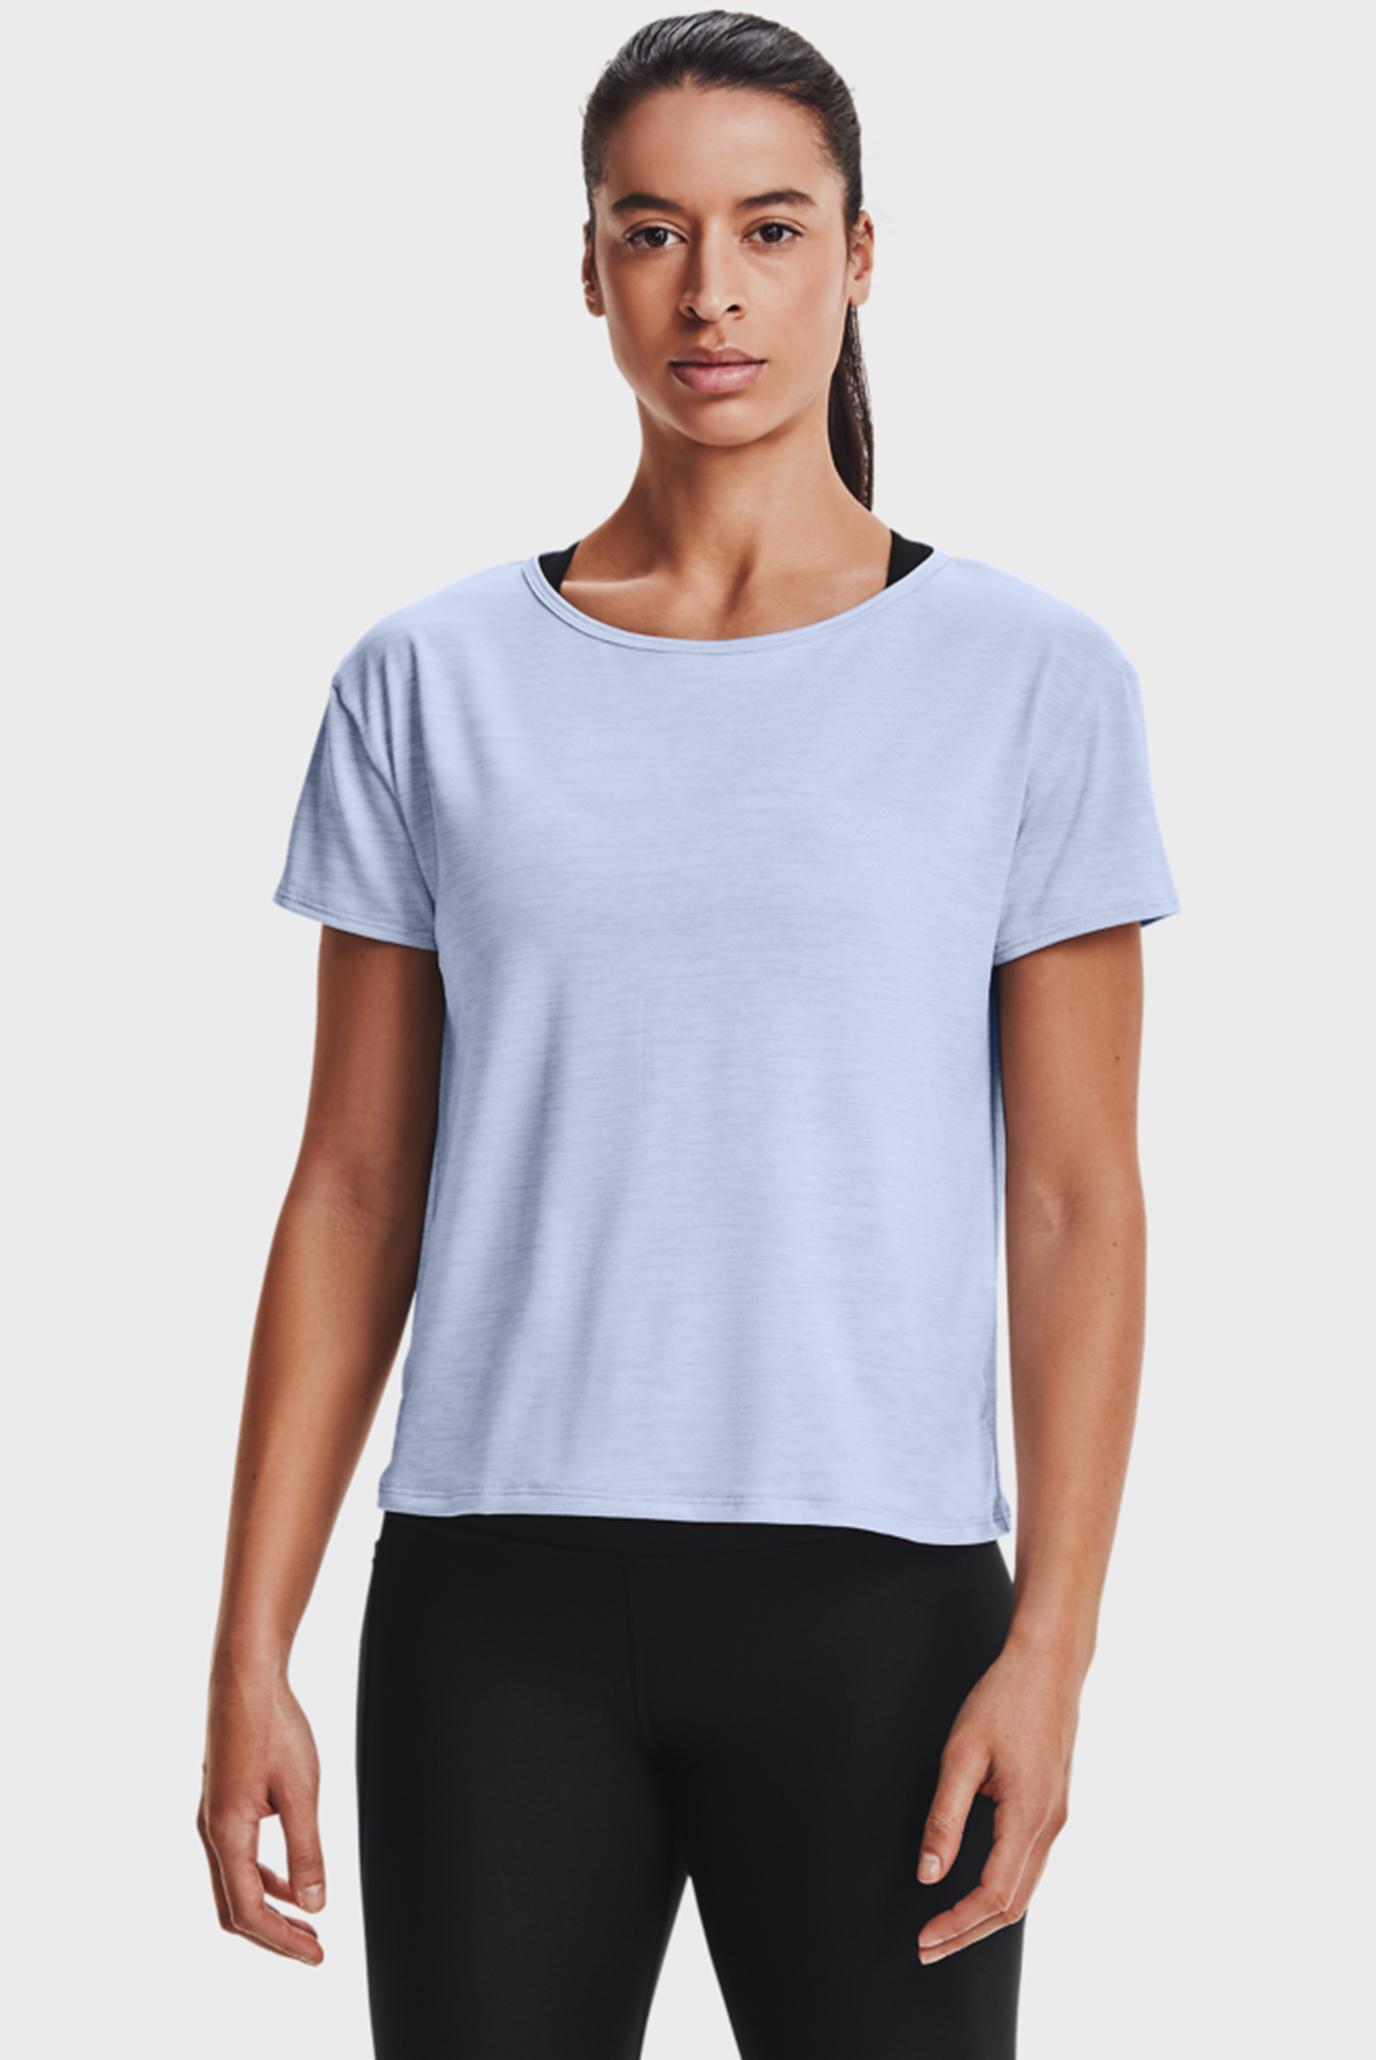 Женская голубая футболка UA Tech Vent SS-BLU 1